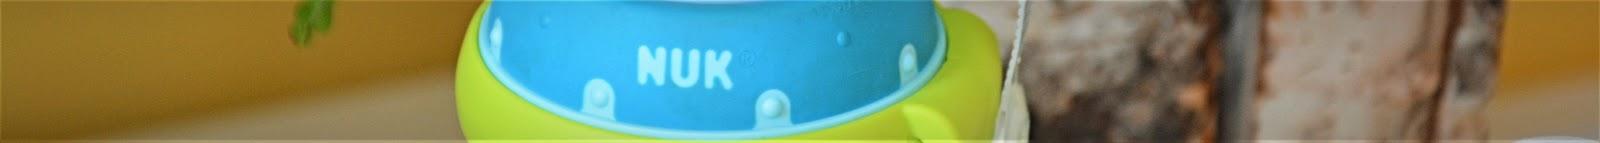 Produkty niemowlęce: NUK & BUCHEN